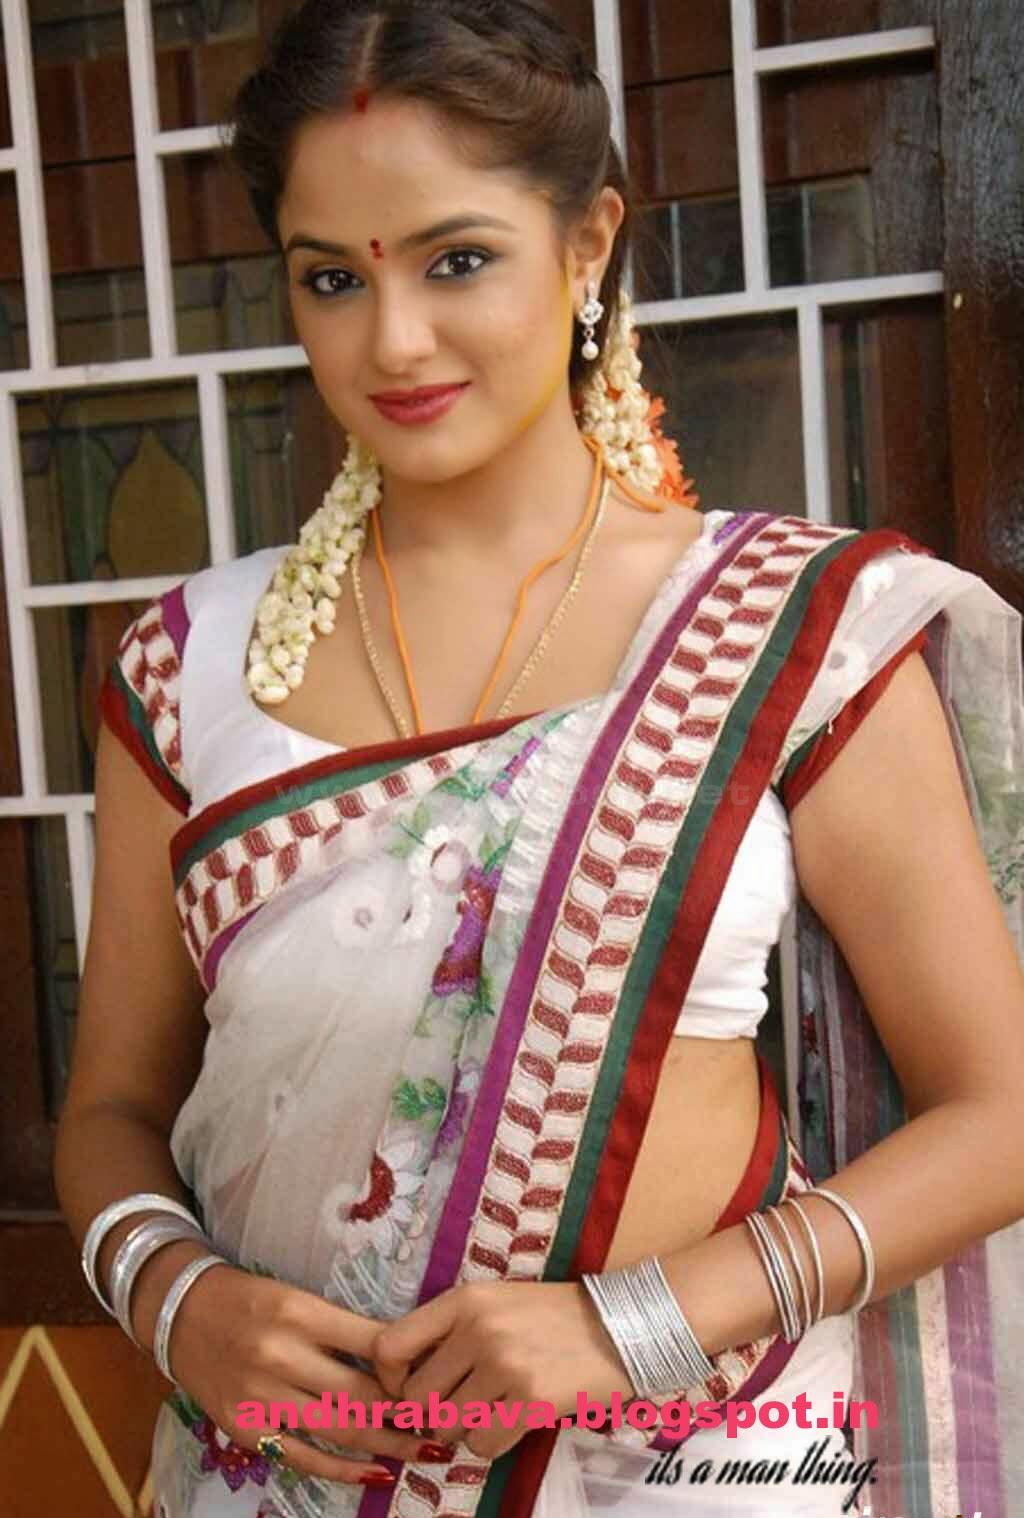 Hot And Spicy Actress Photos Gallery: Actress Asmitha Sood Hot And Spicy Photos Gallery